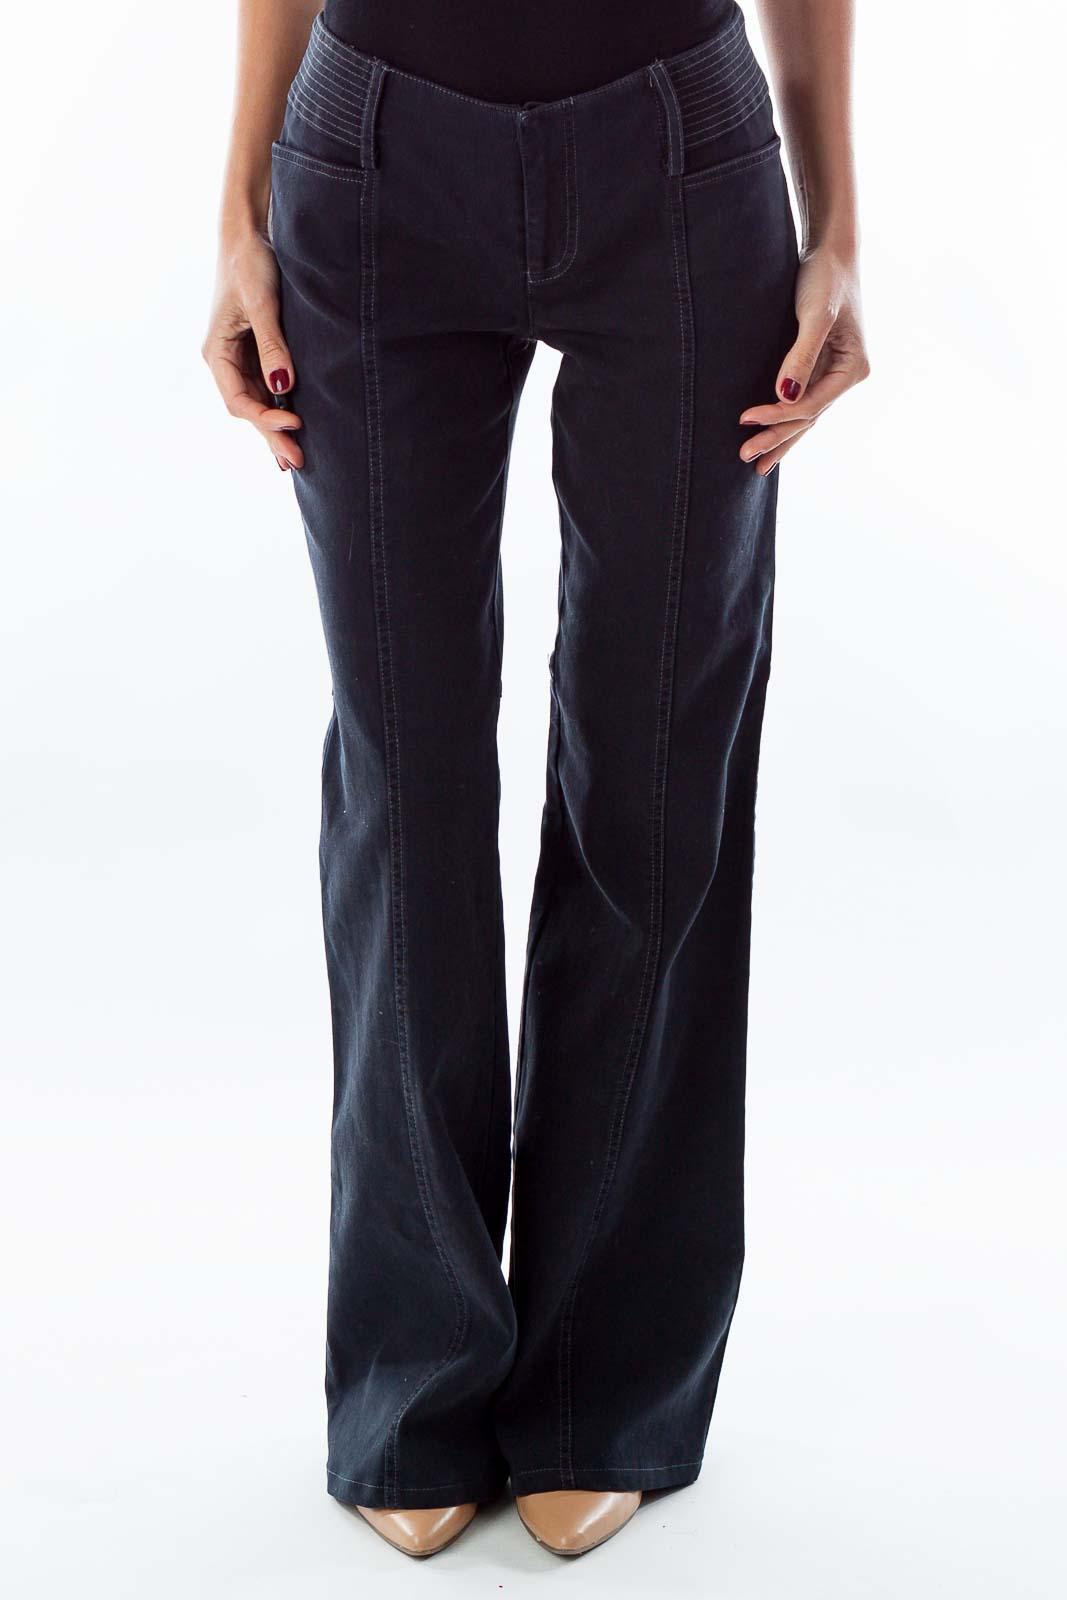 Navy Corduroy Bell-Bottom Pants